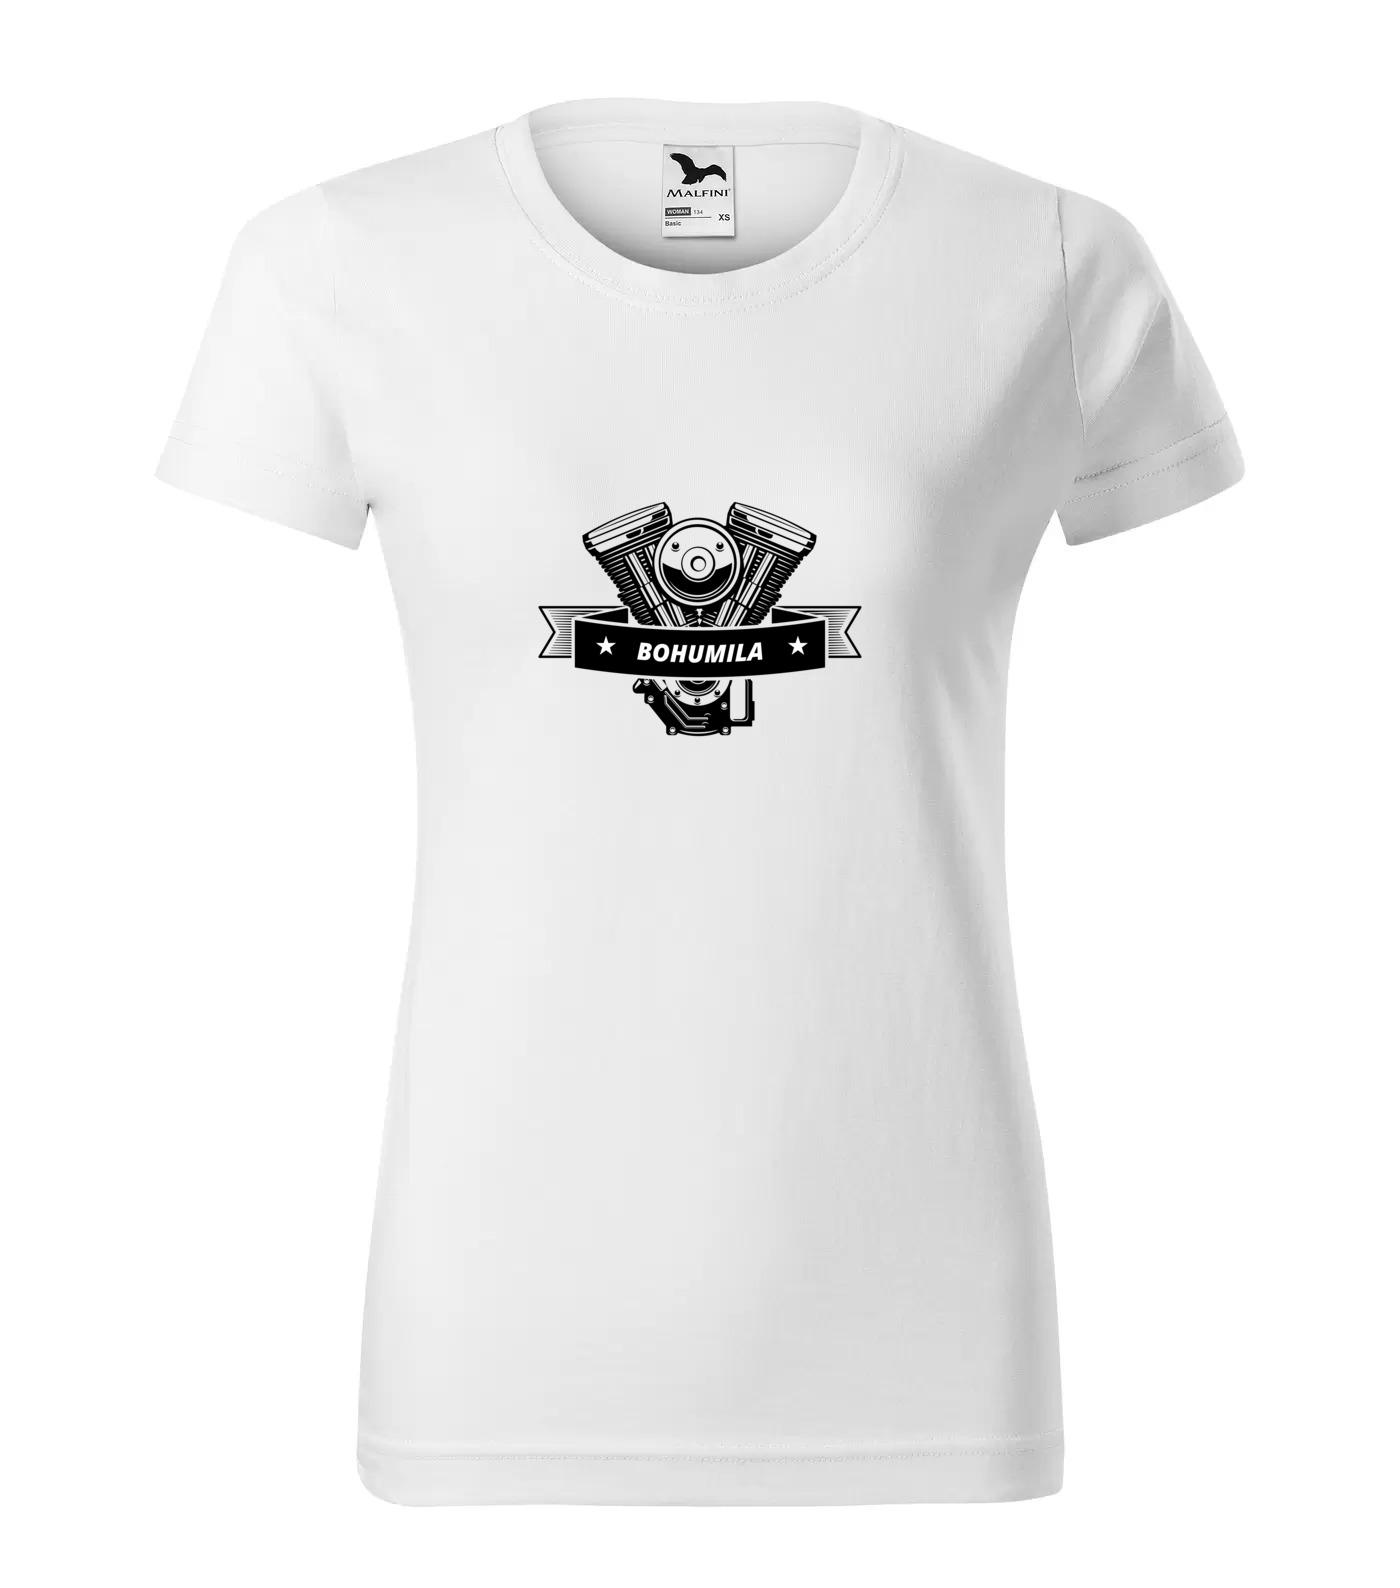 Tričko Motorkářka Bohumila